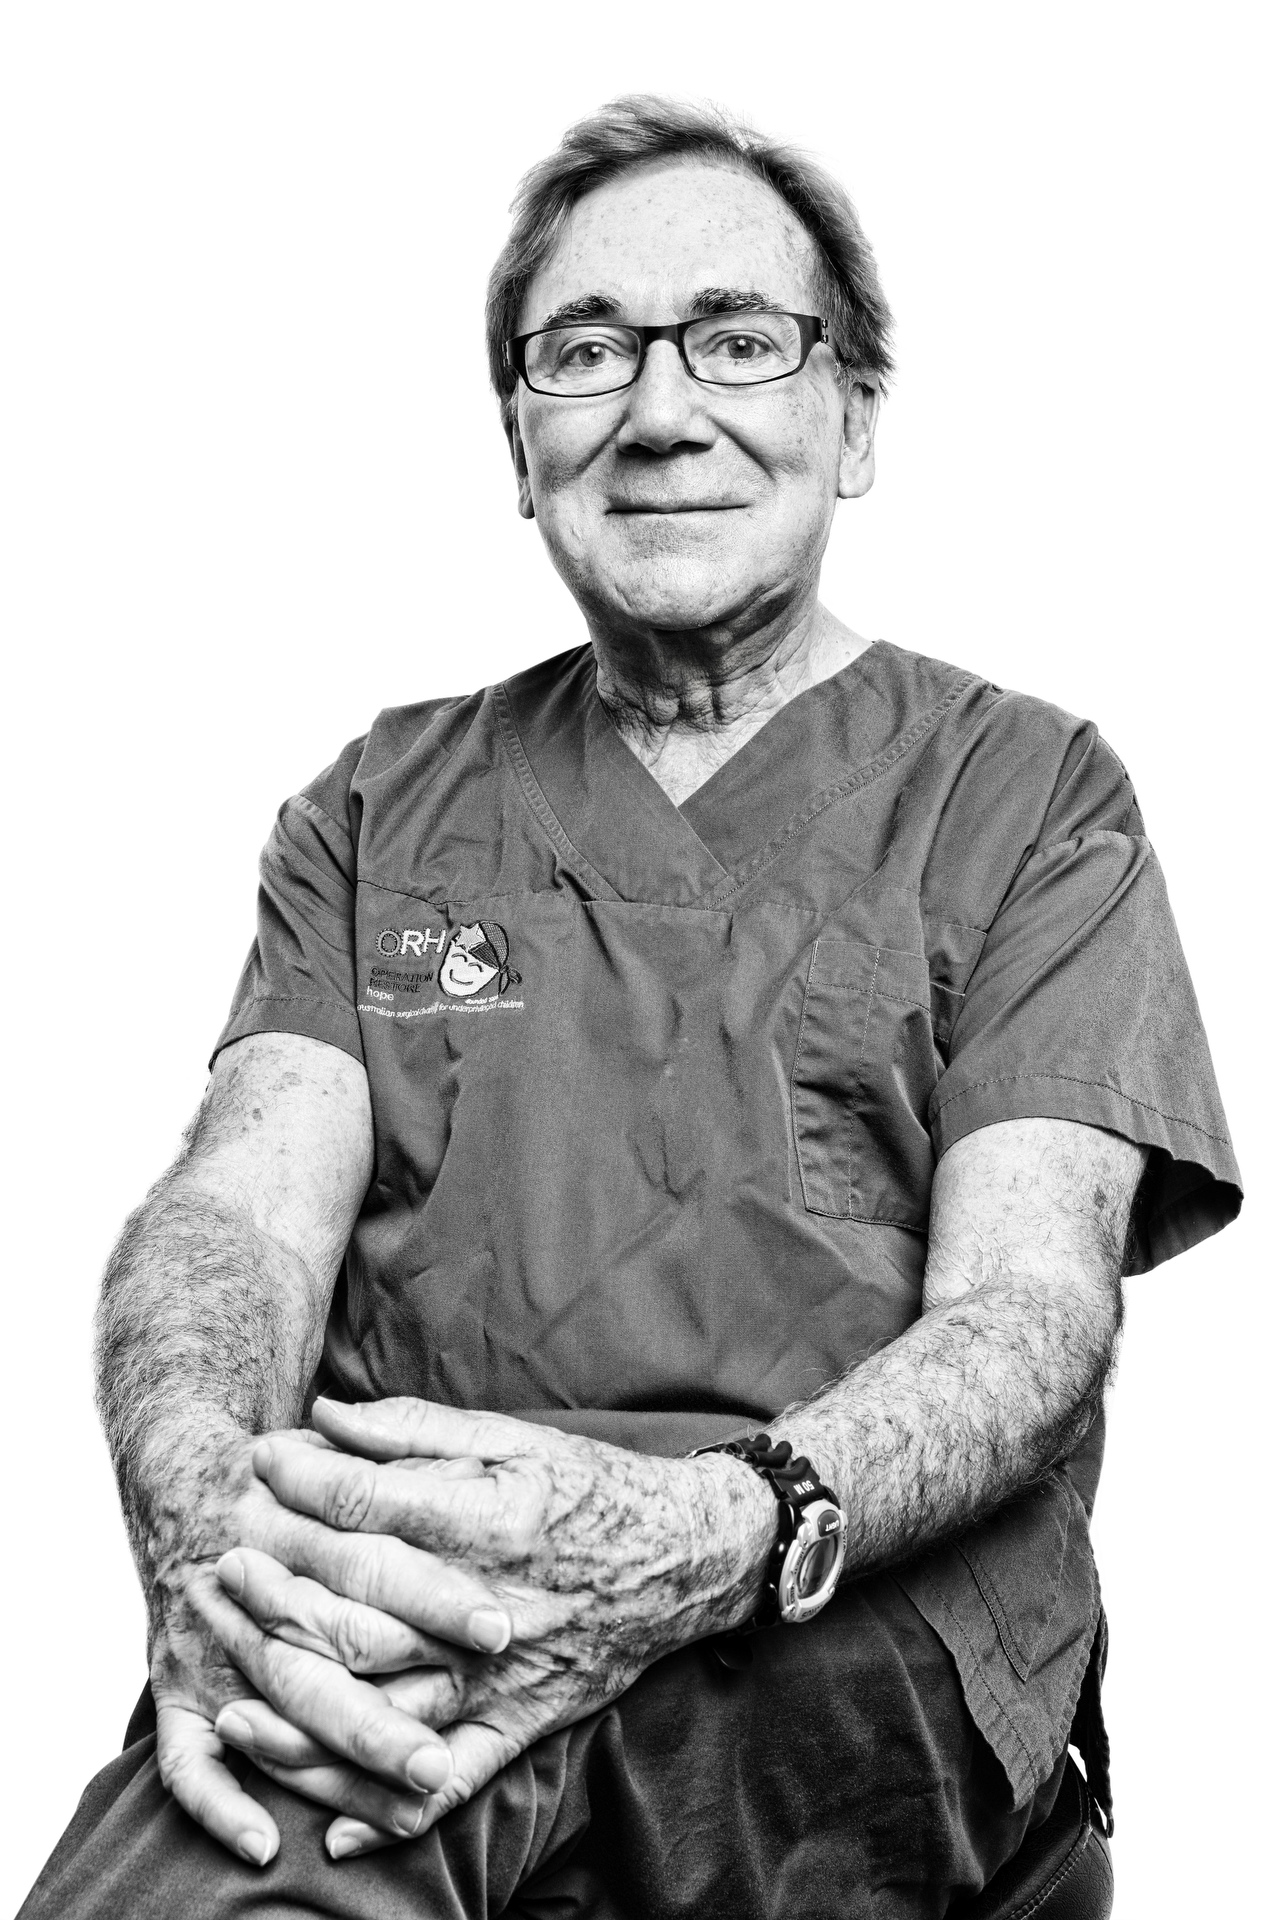 Sydney portrait photographer, personal branding, head shots, corporate photography, Surgeon, charity